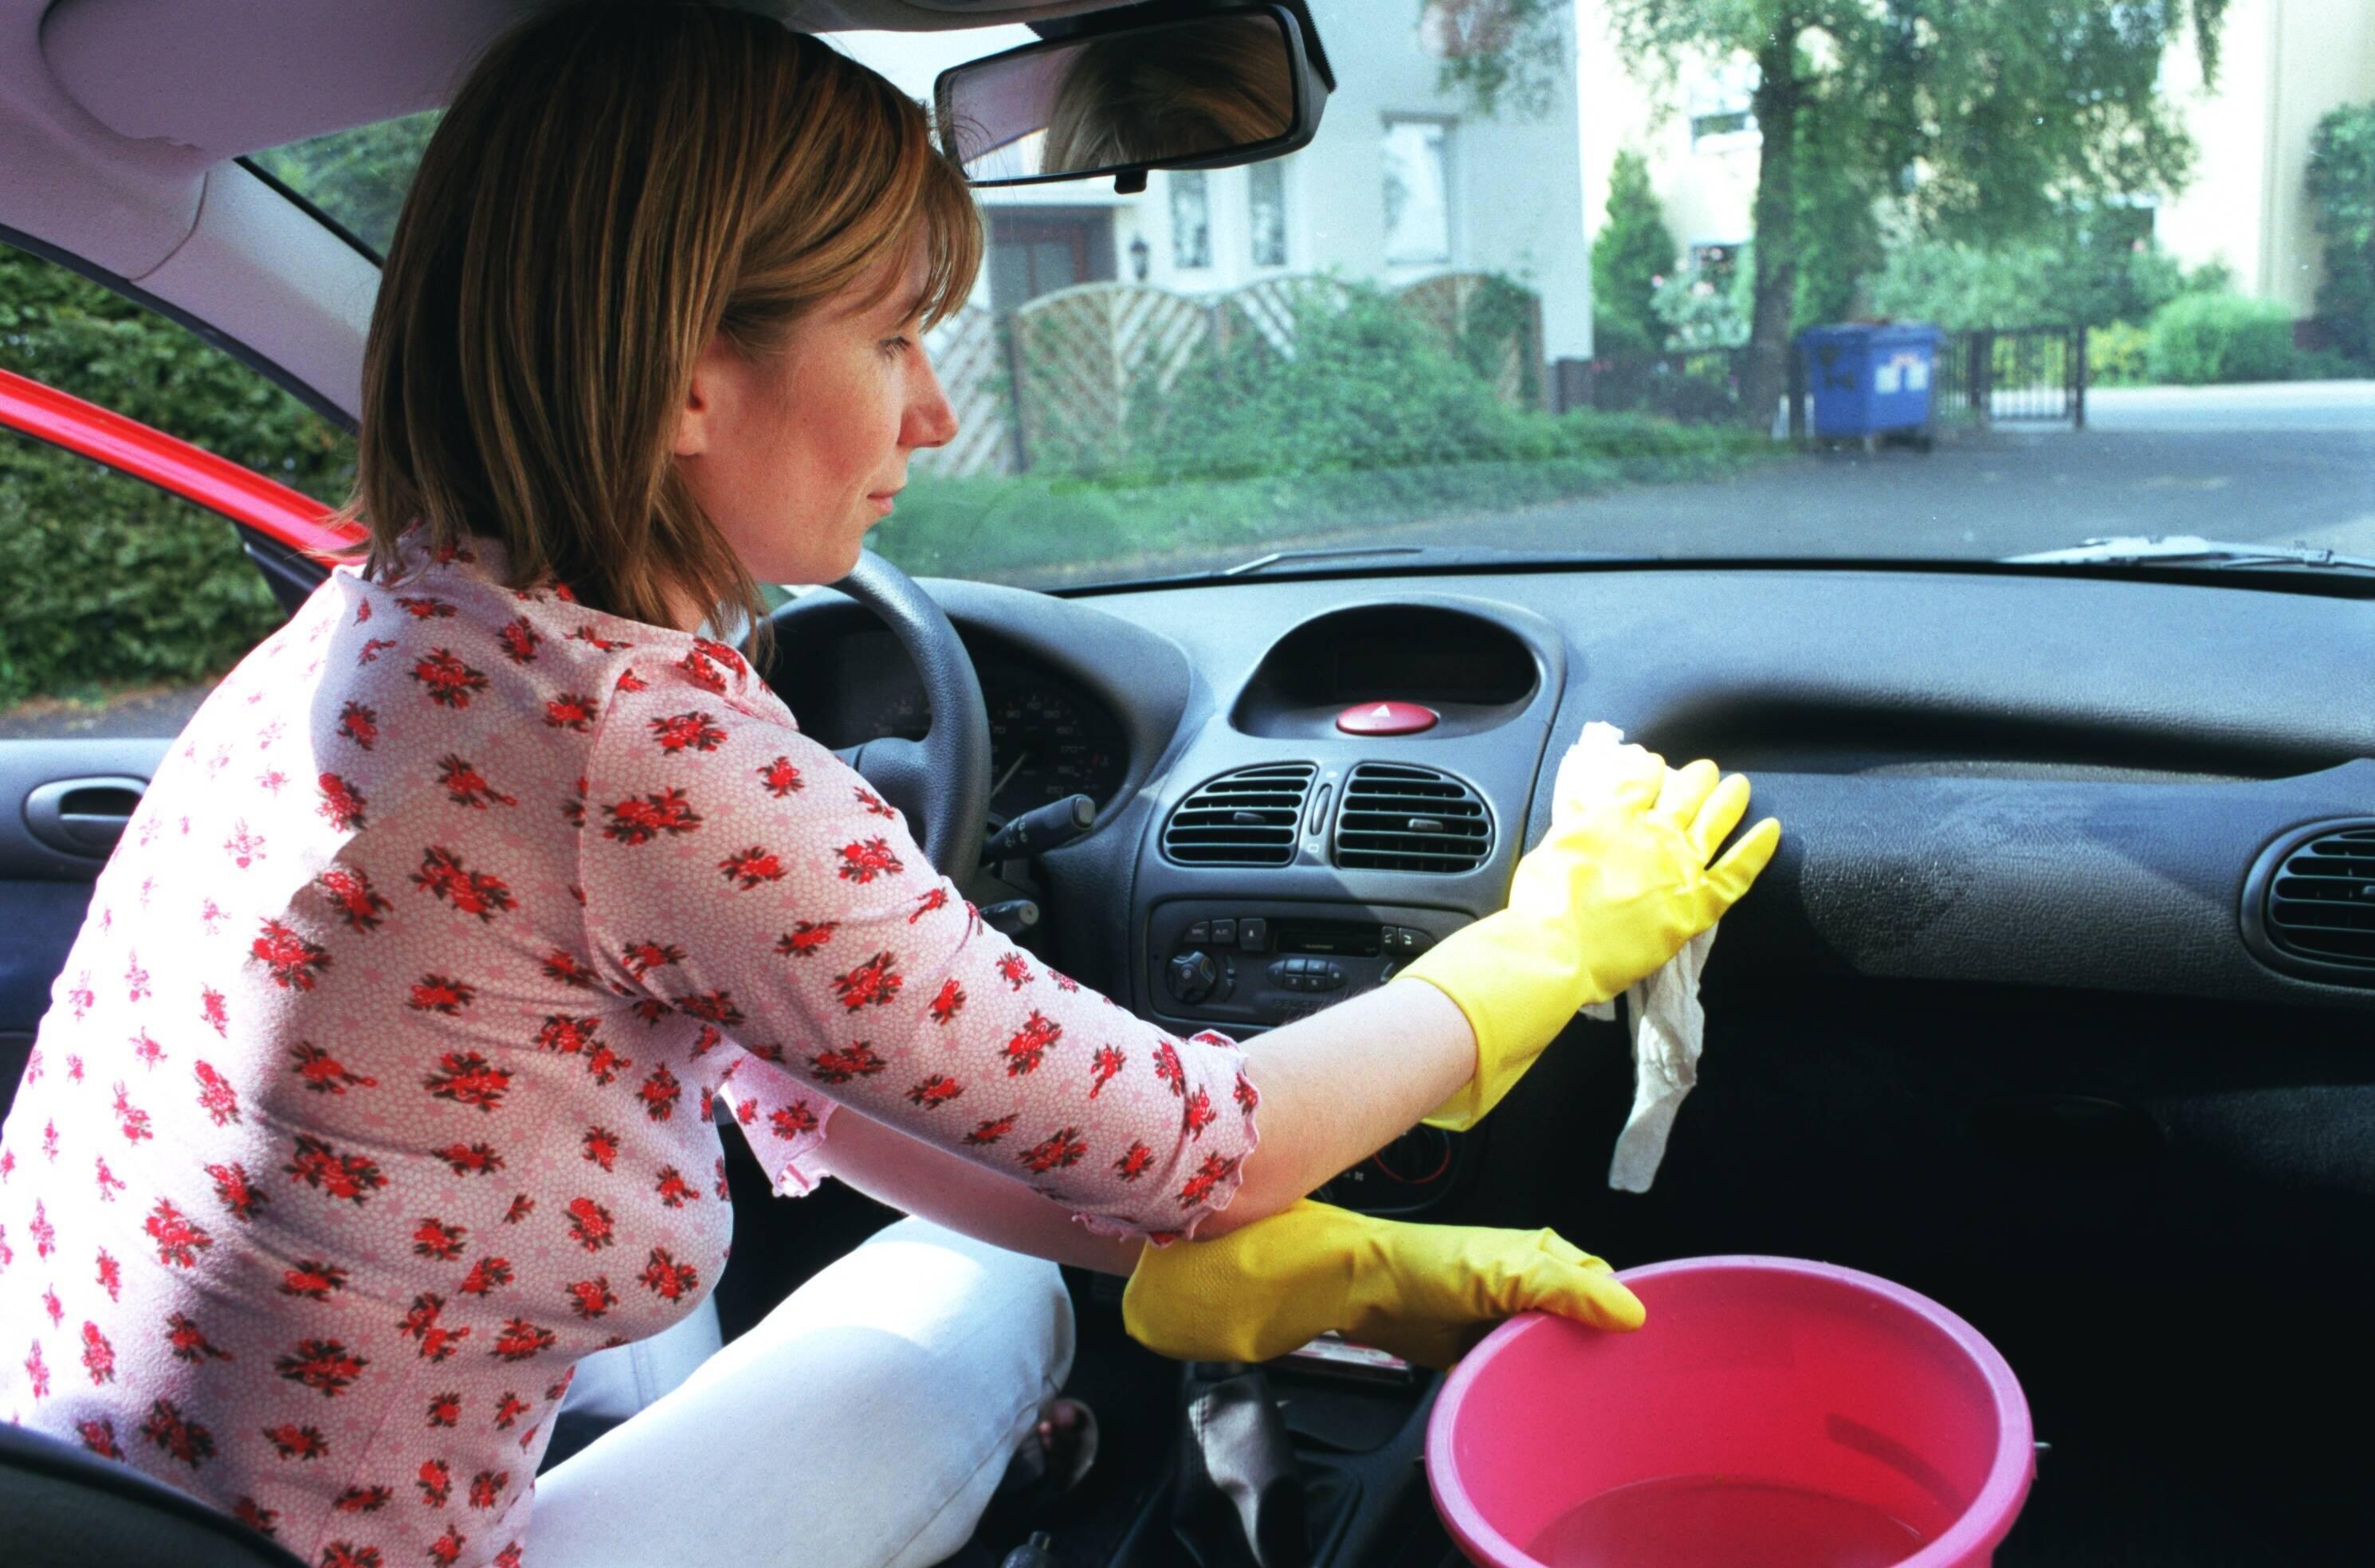 Bild zu Frau reinigt Autoinnenraum